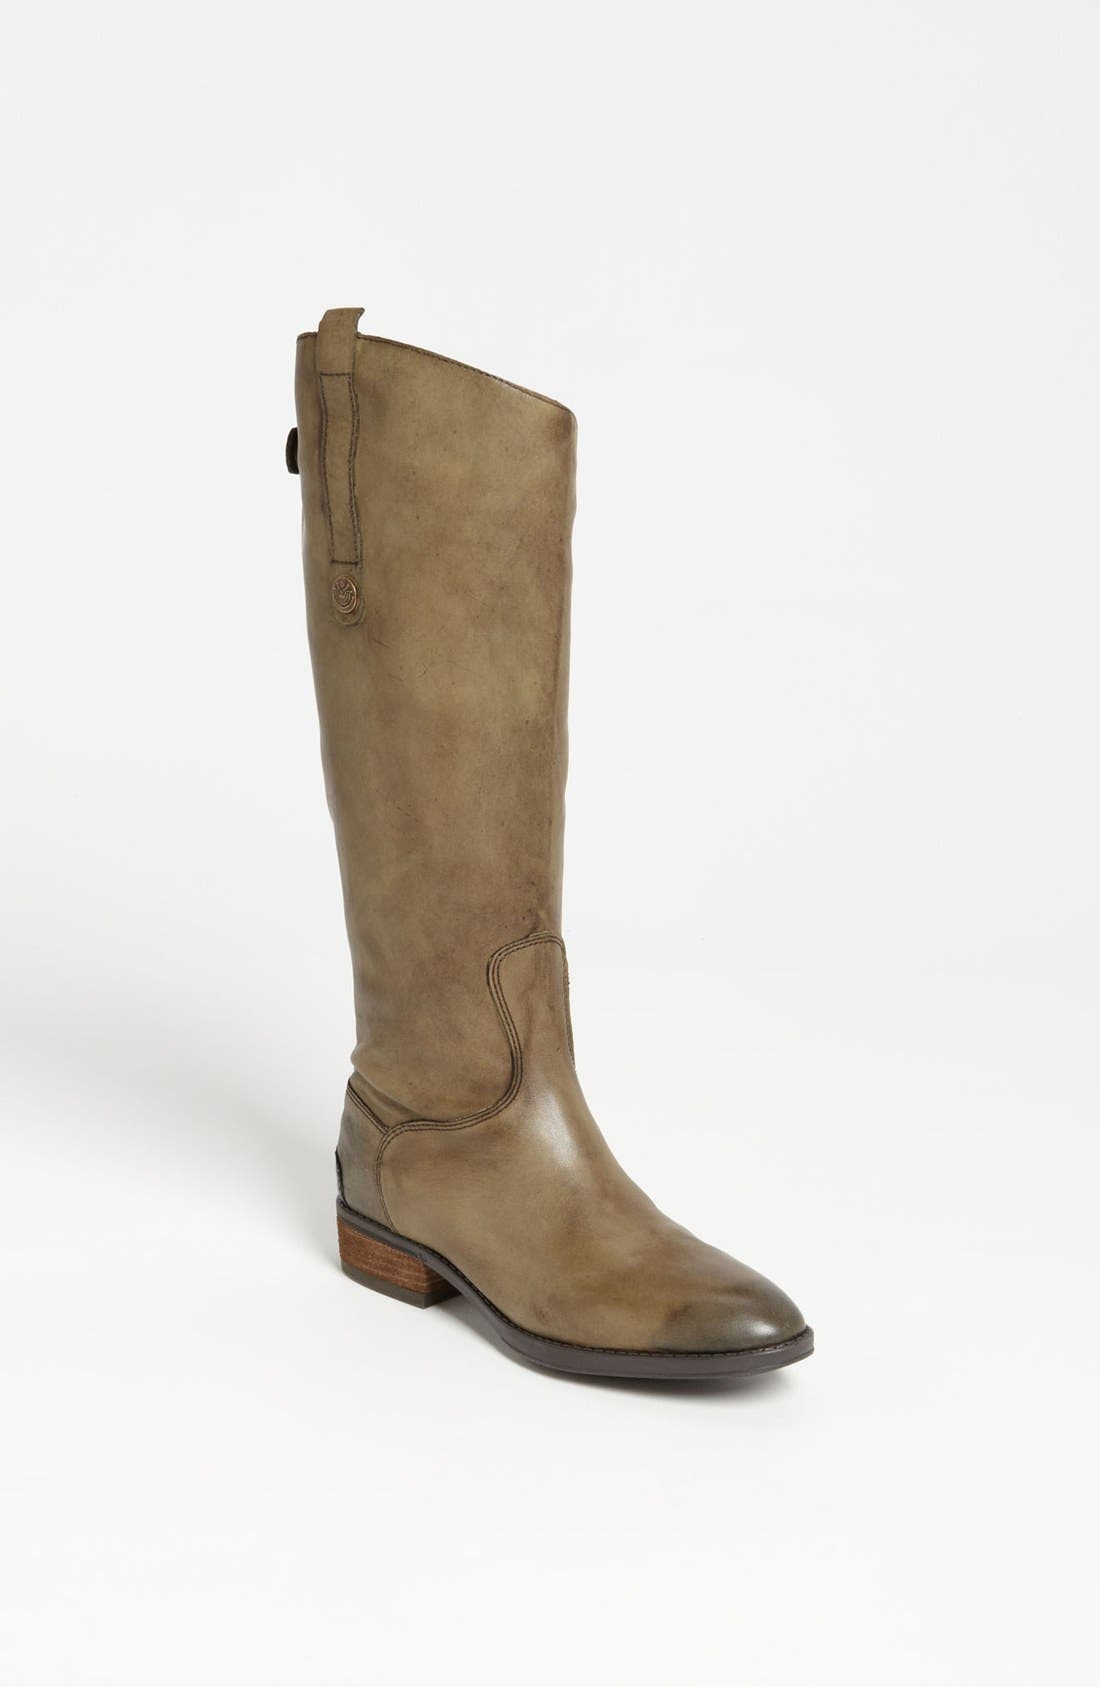 Main Image - Sam Edelman 'Penny' Boot (Wide Calf) (Women)